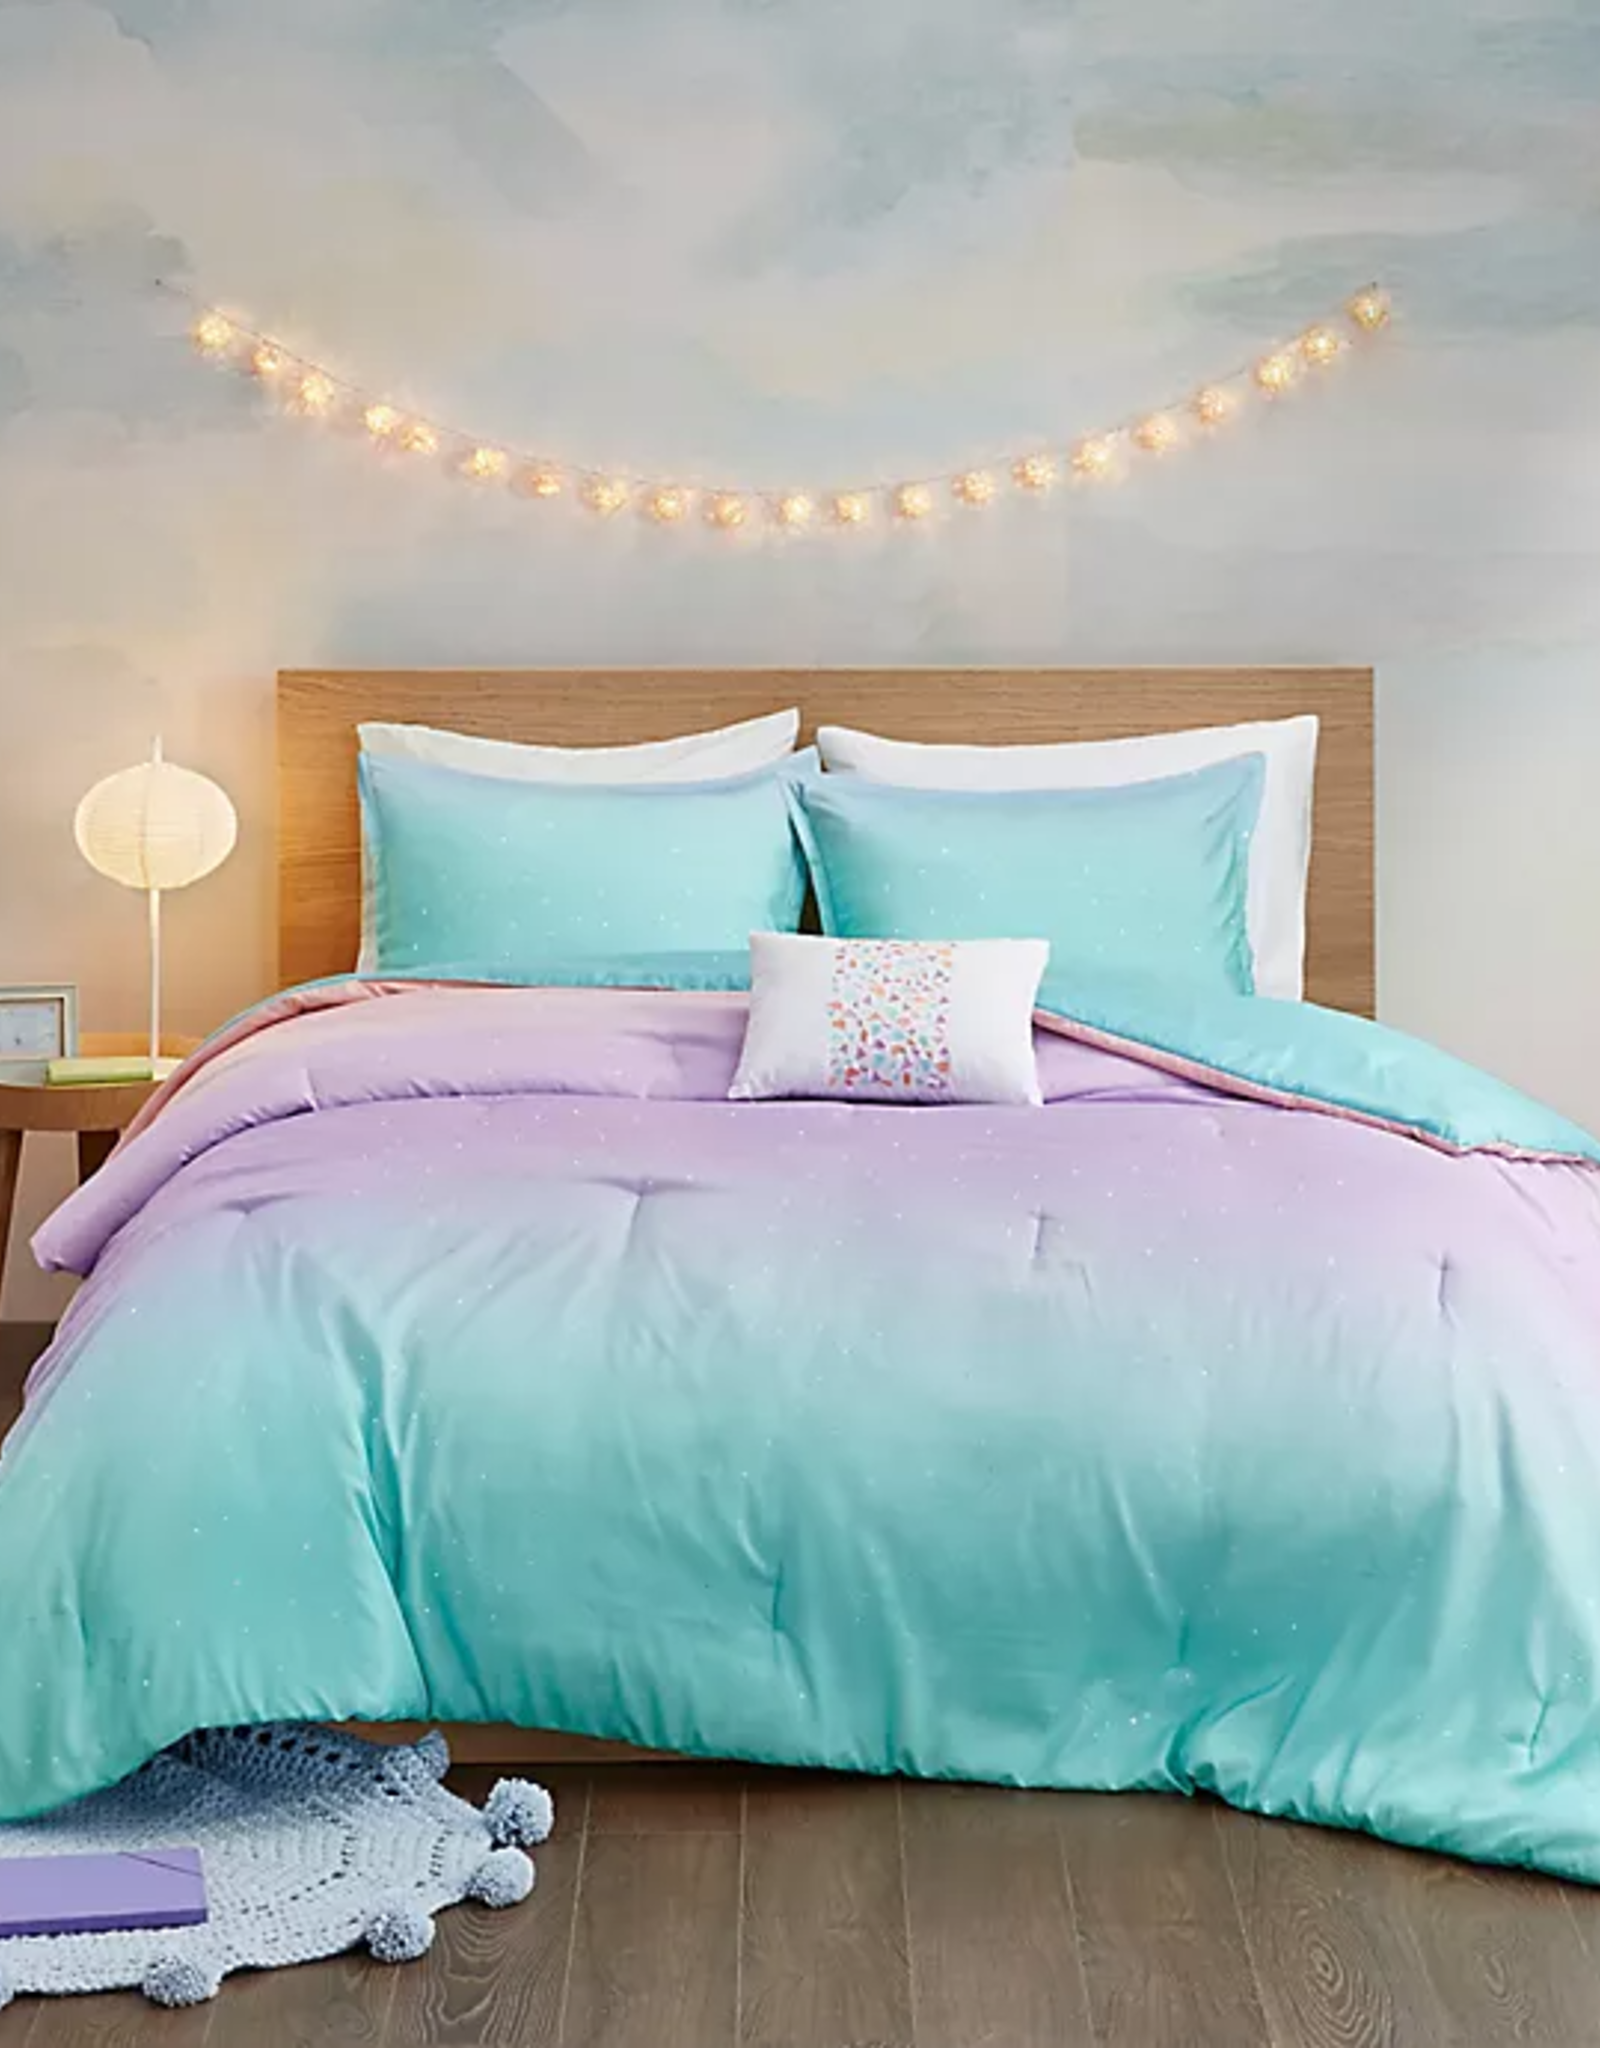 JLA HOME/E & E CO LTD Glimmer Full/Queen Bedding Set